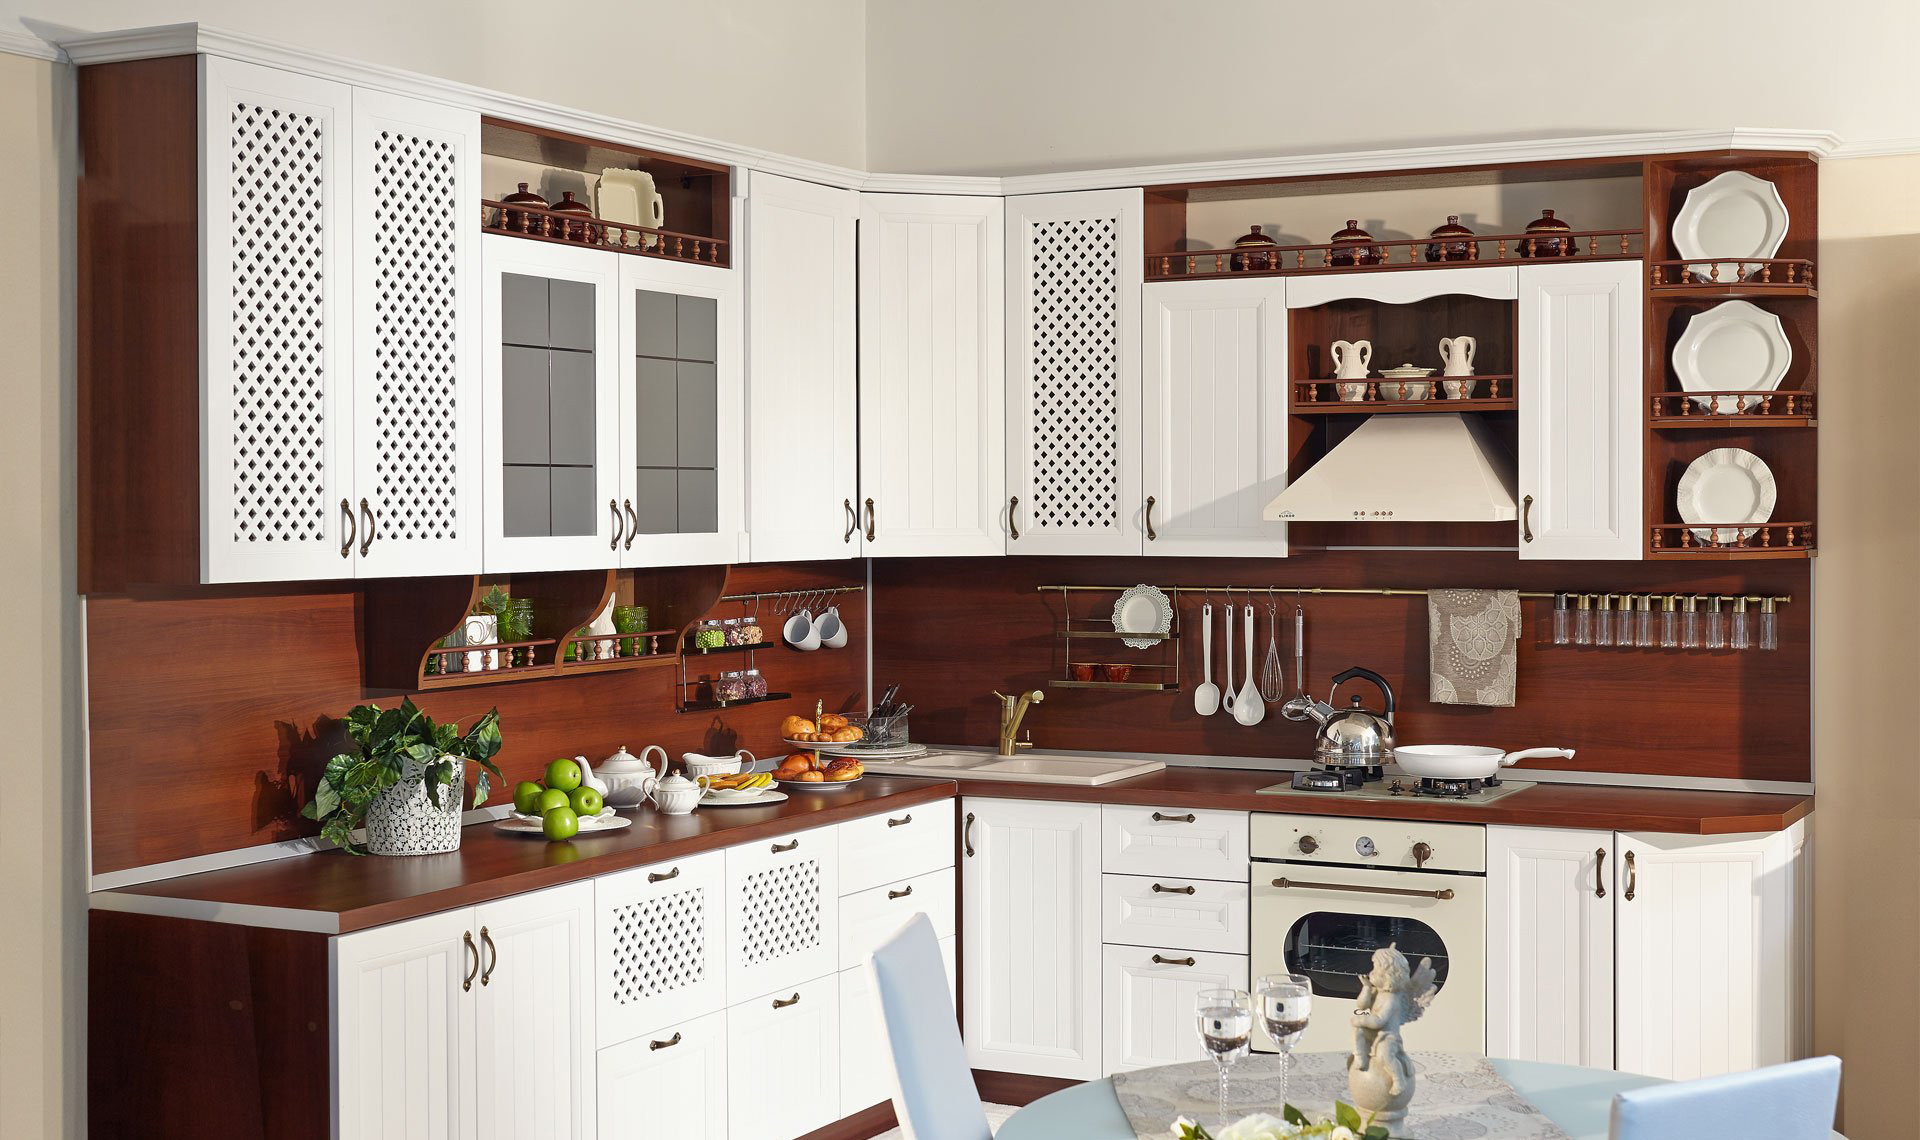 Белый фасад кухонного гарнитура в стиле кантри